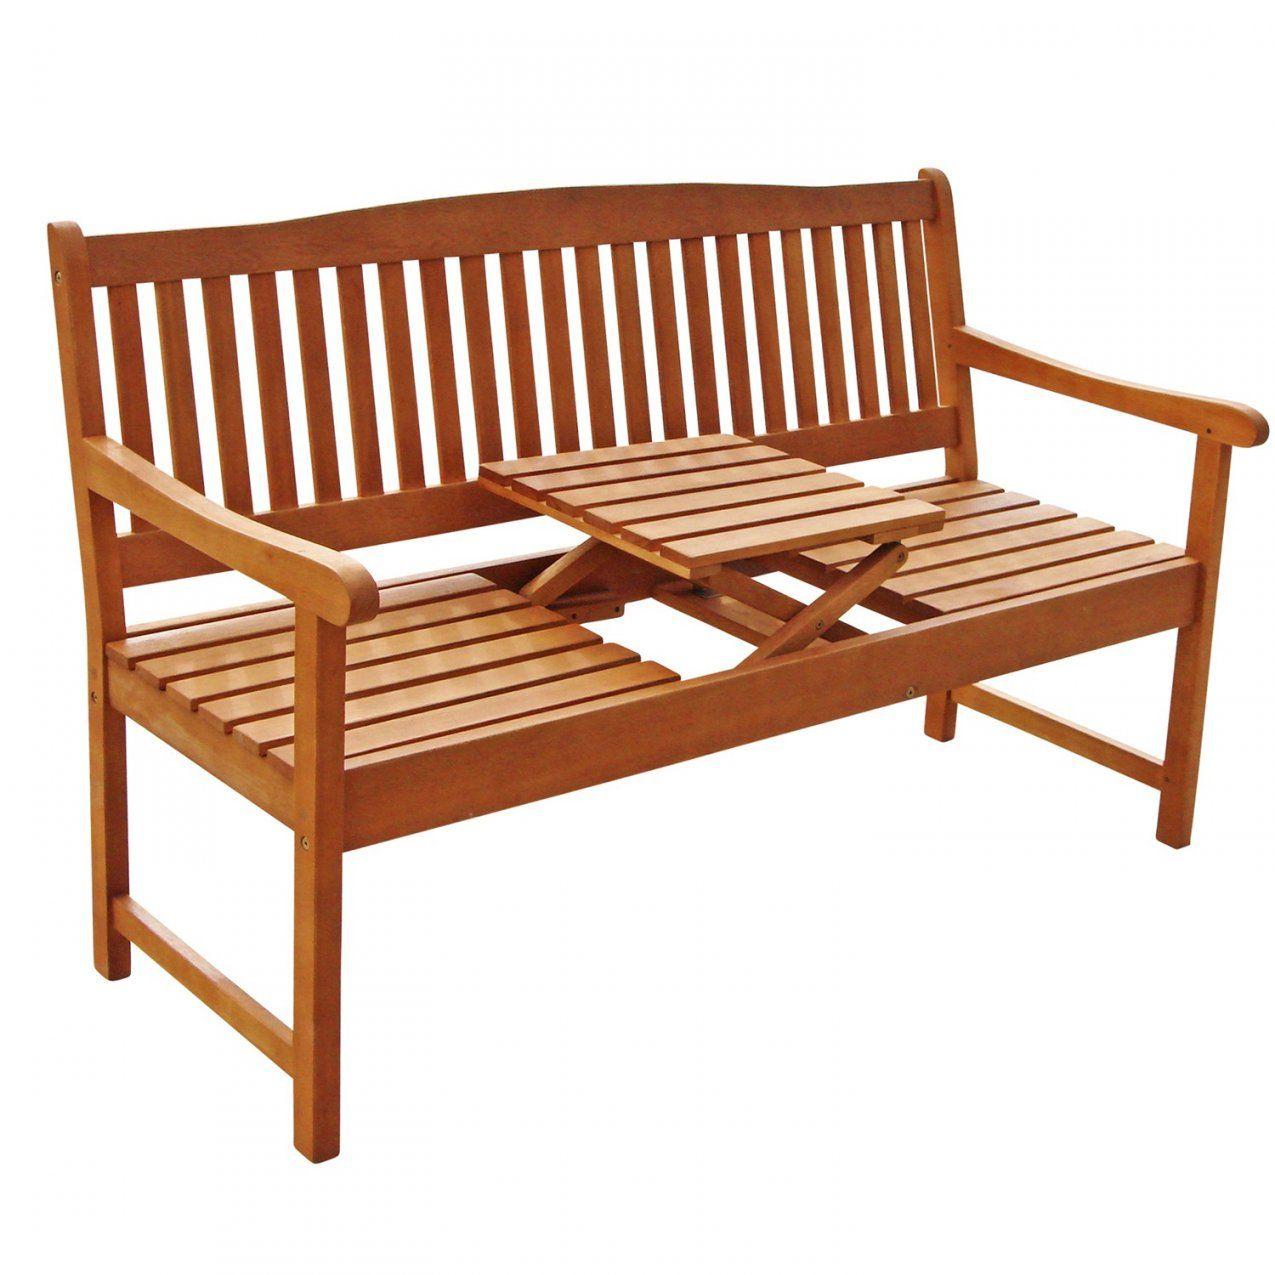 holzbank mit integriertem tisch haus design ideen. Black Bedroom Furniture Sets. Home Design Ideas